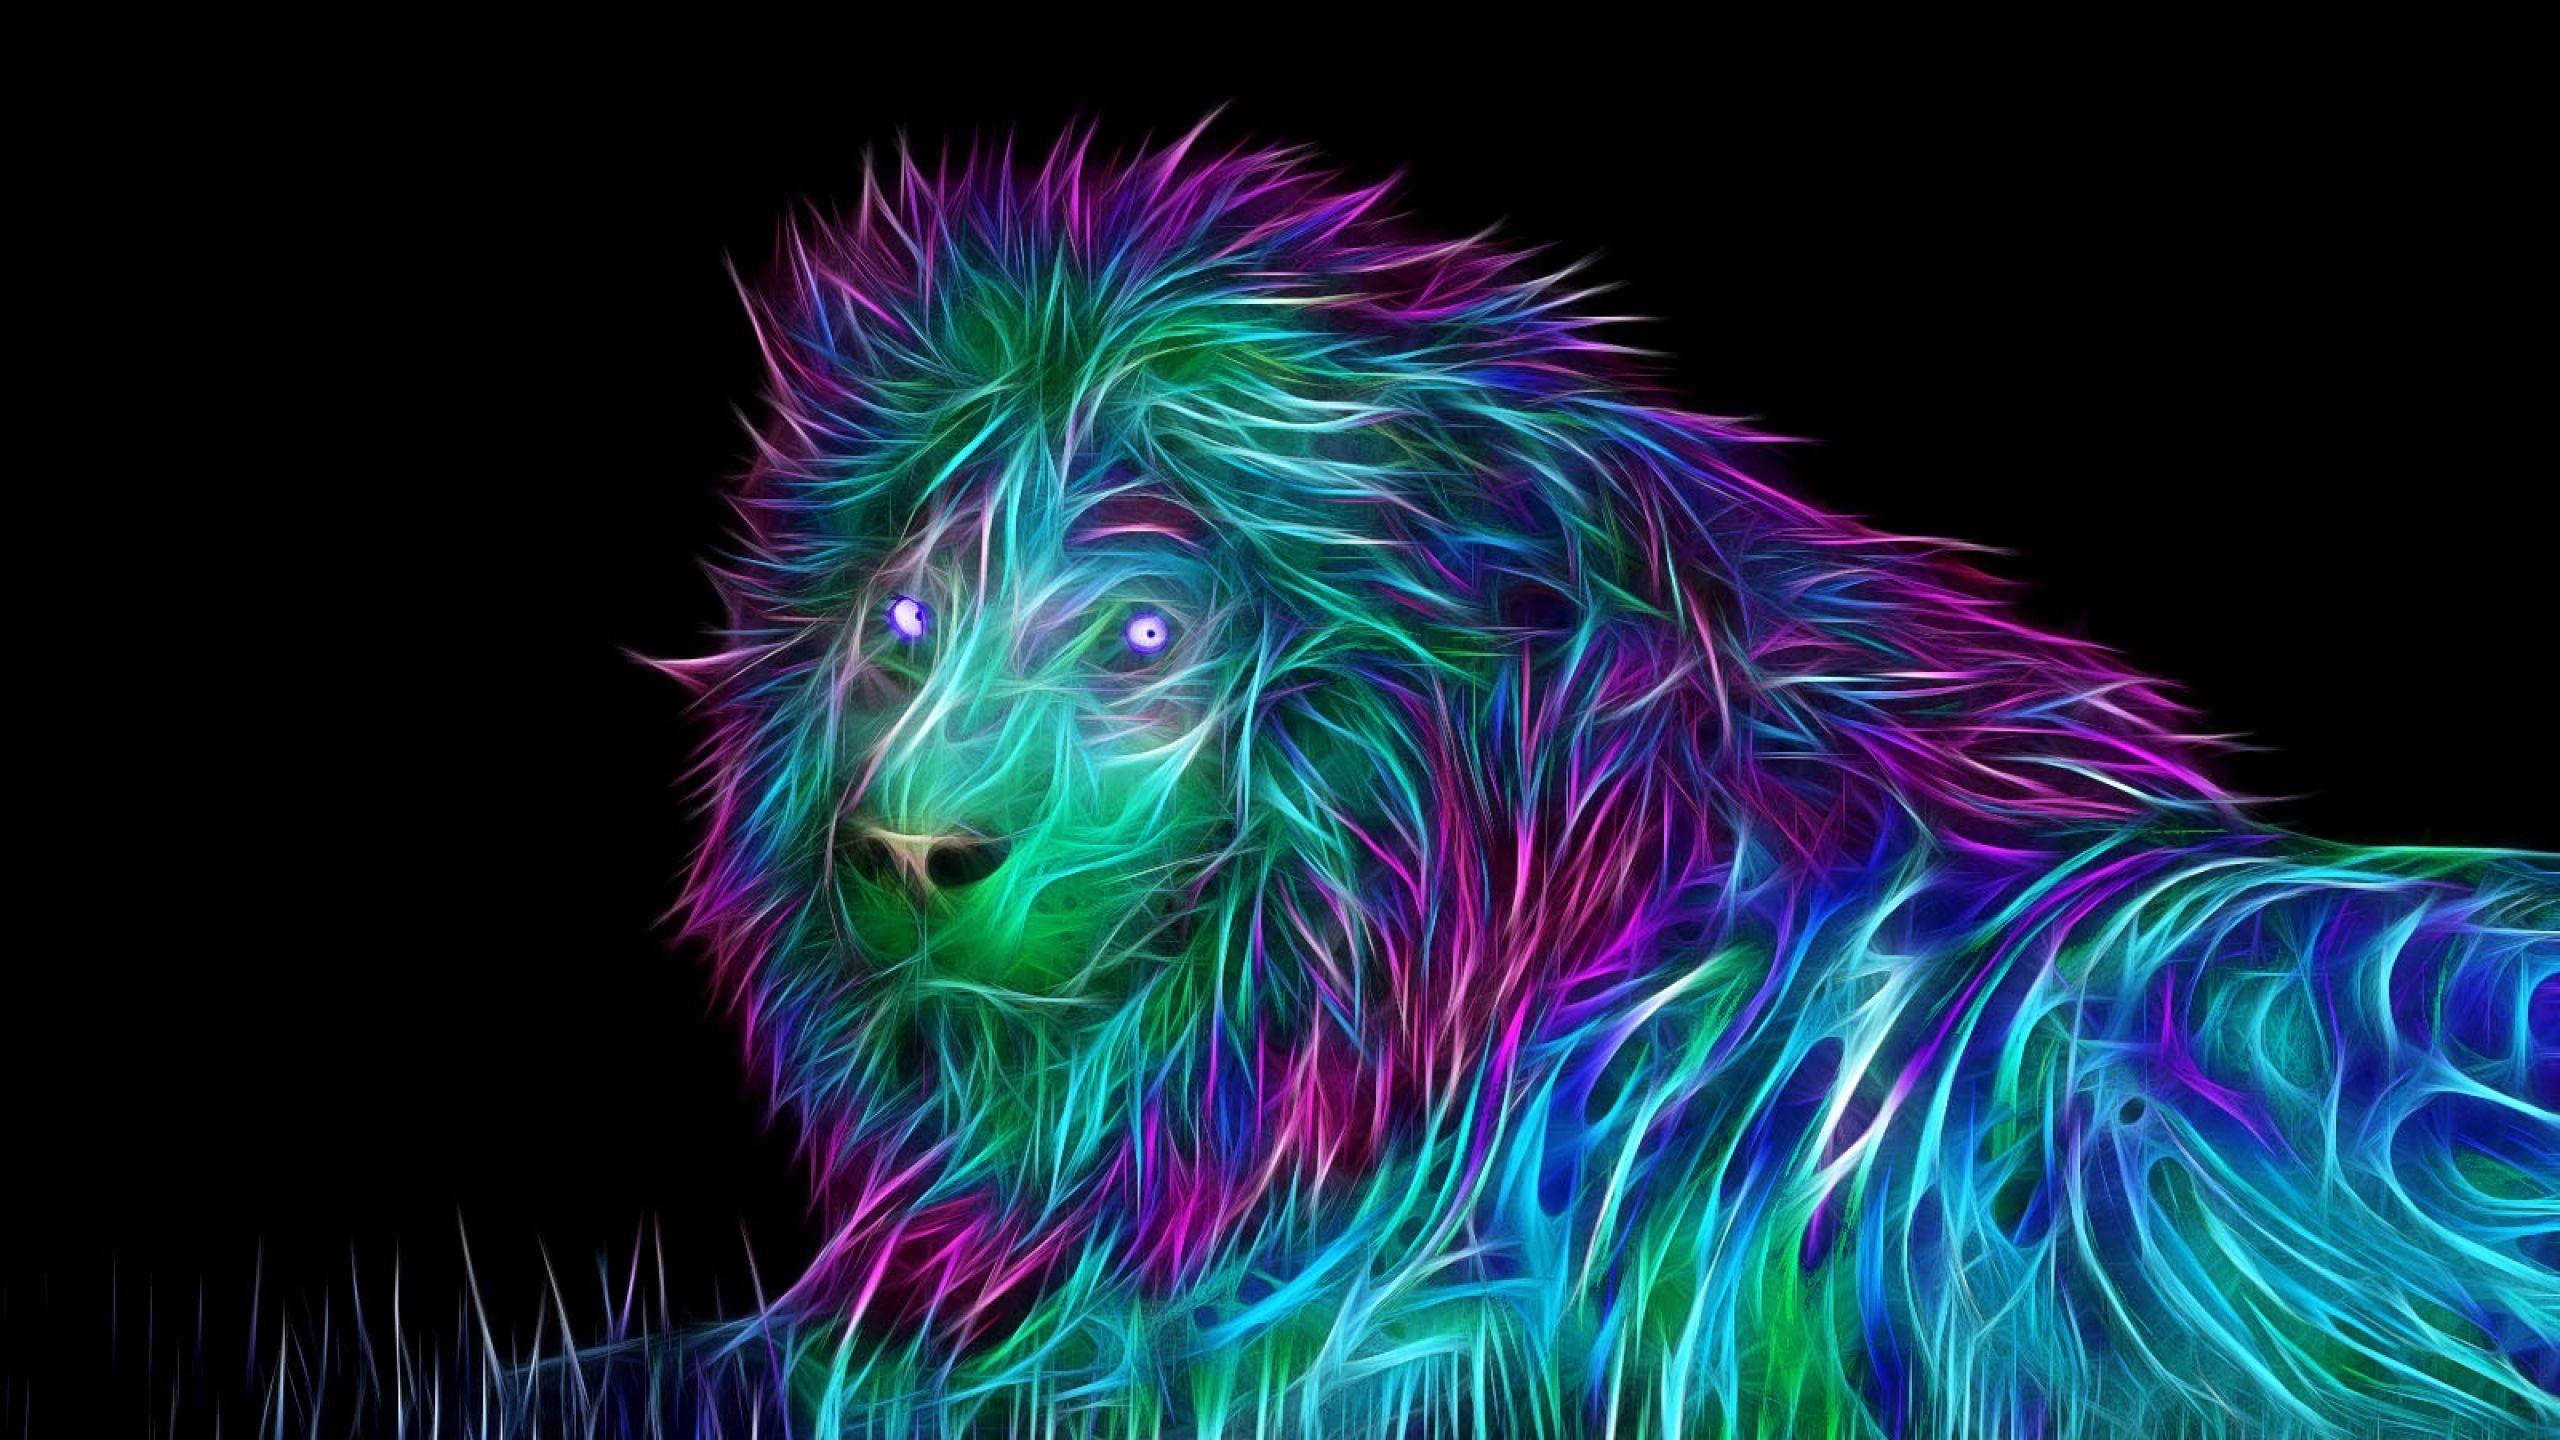 Neon lion wallpaper neon lion digitalart FITNESS AND